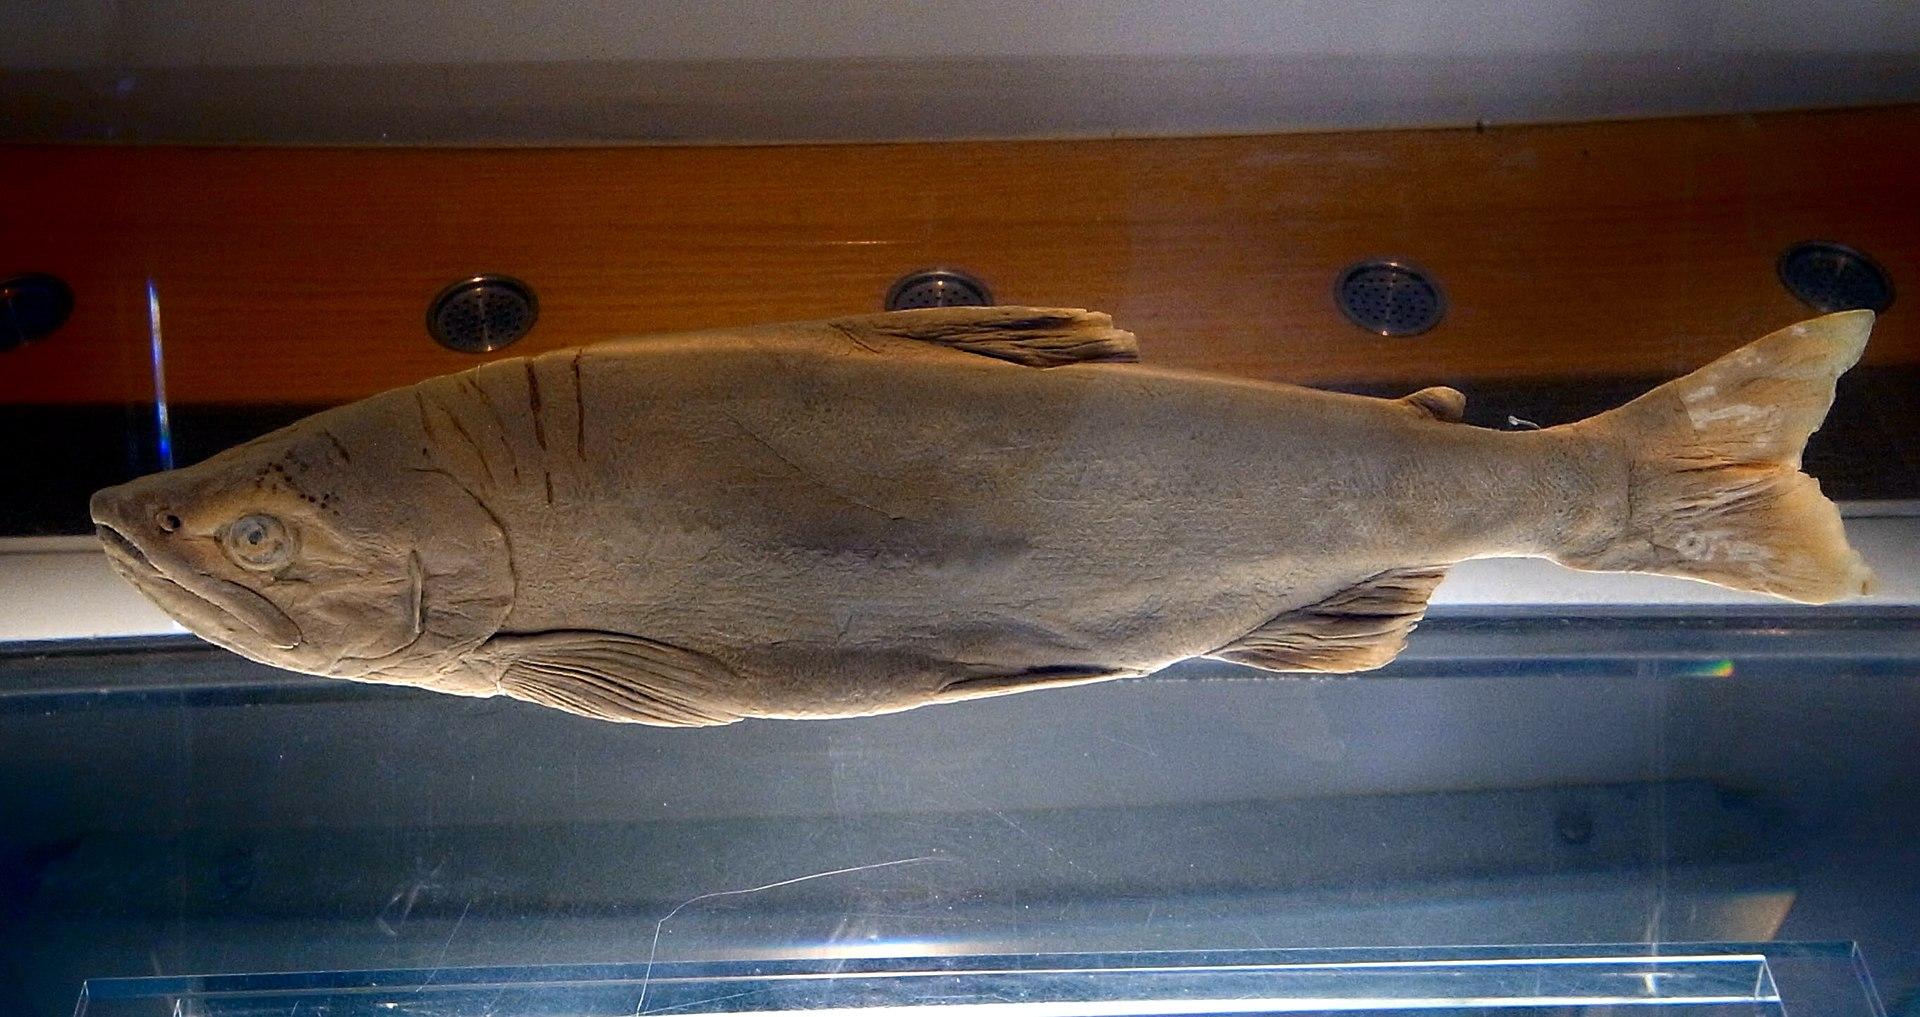 https://upload.wikimedia.org/wikipedia/commons/thumb/d/df/Oncorhynchus_kawamurae_by_DaijuAzuma.jpg/1920px-Oncorhynchus_kawamurae_by_DaijuAzuma.jpg